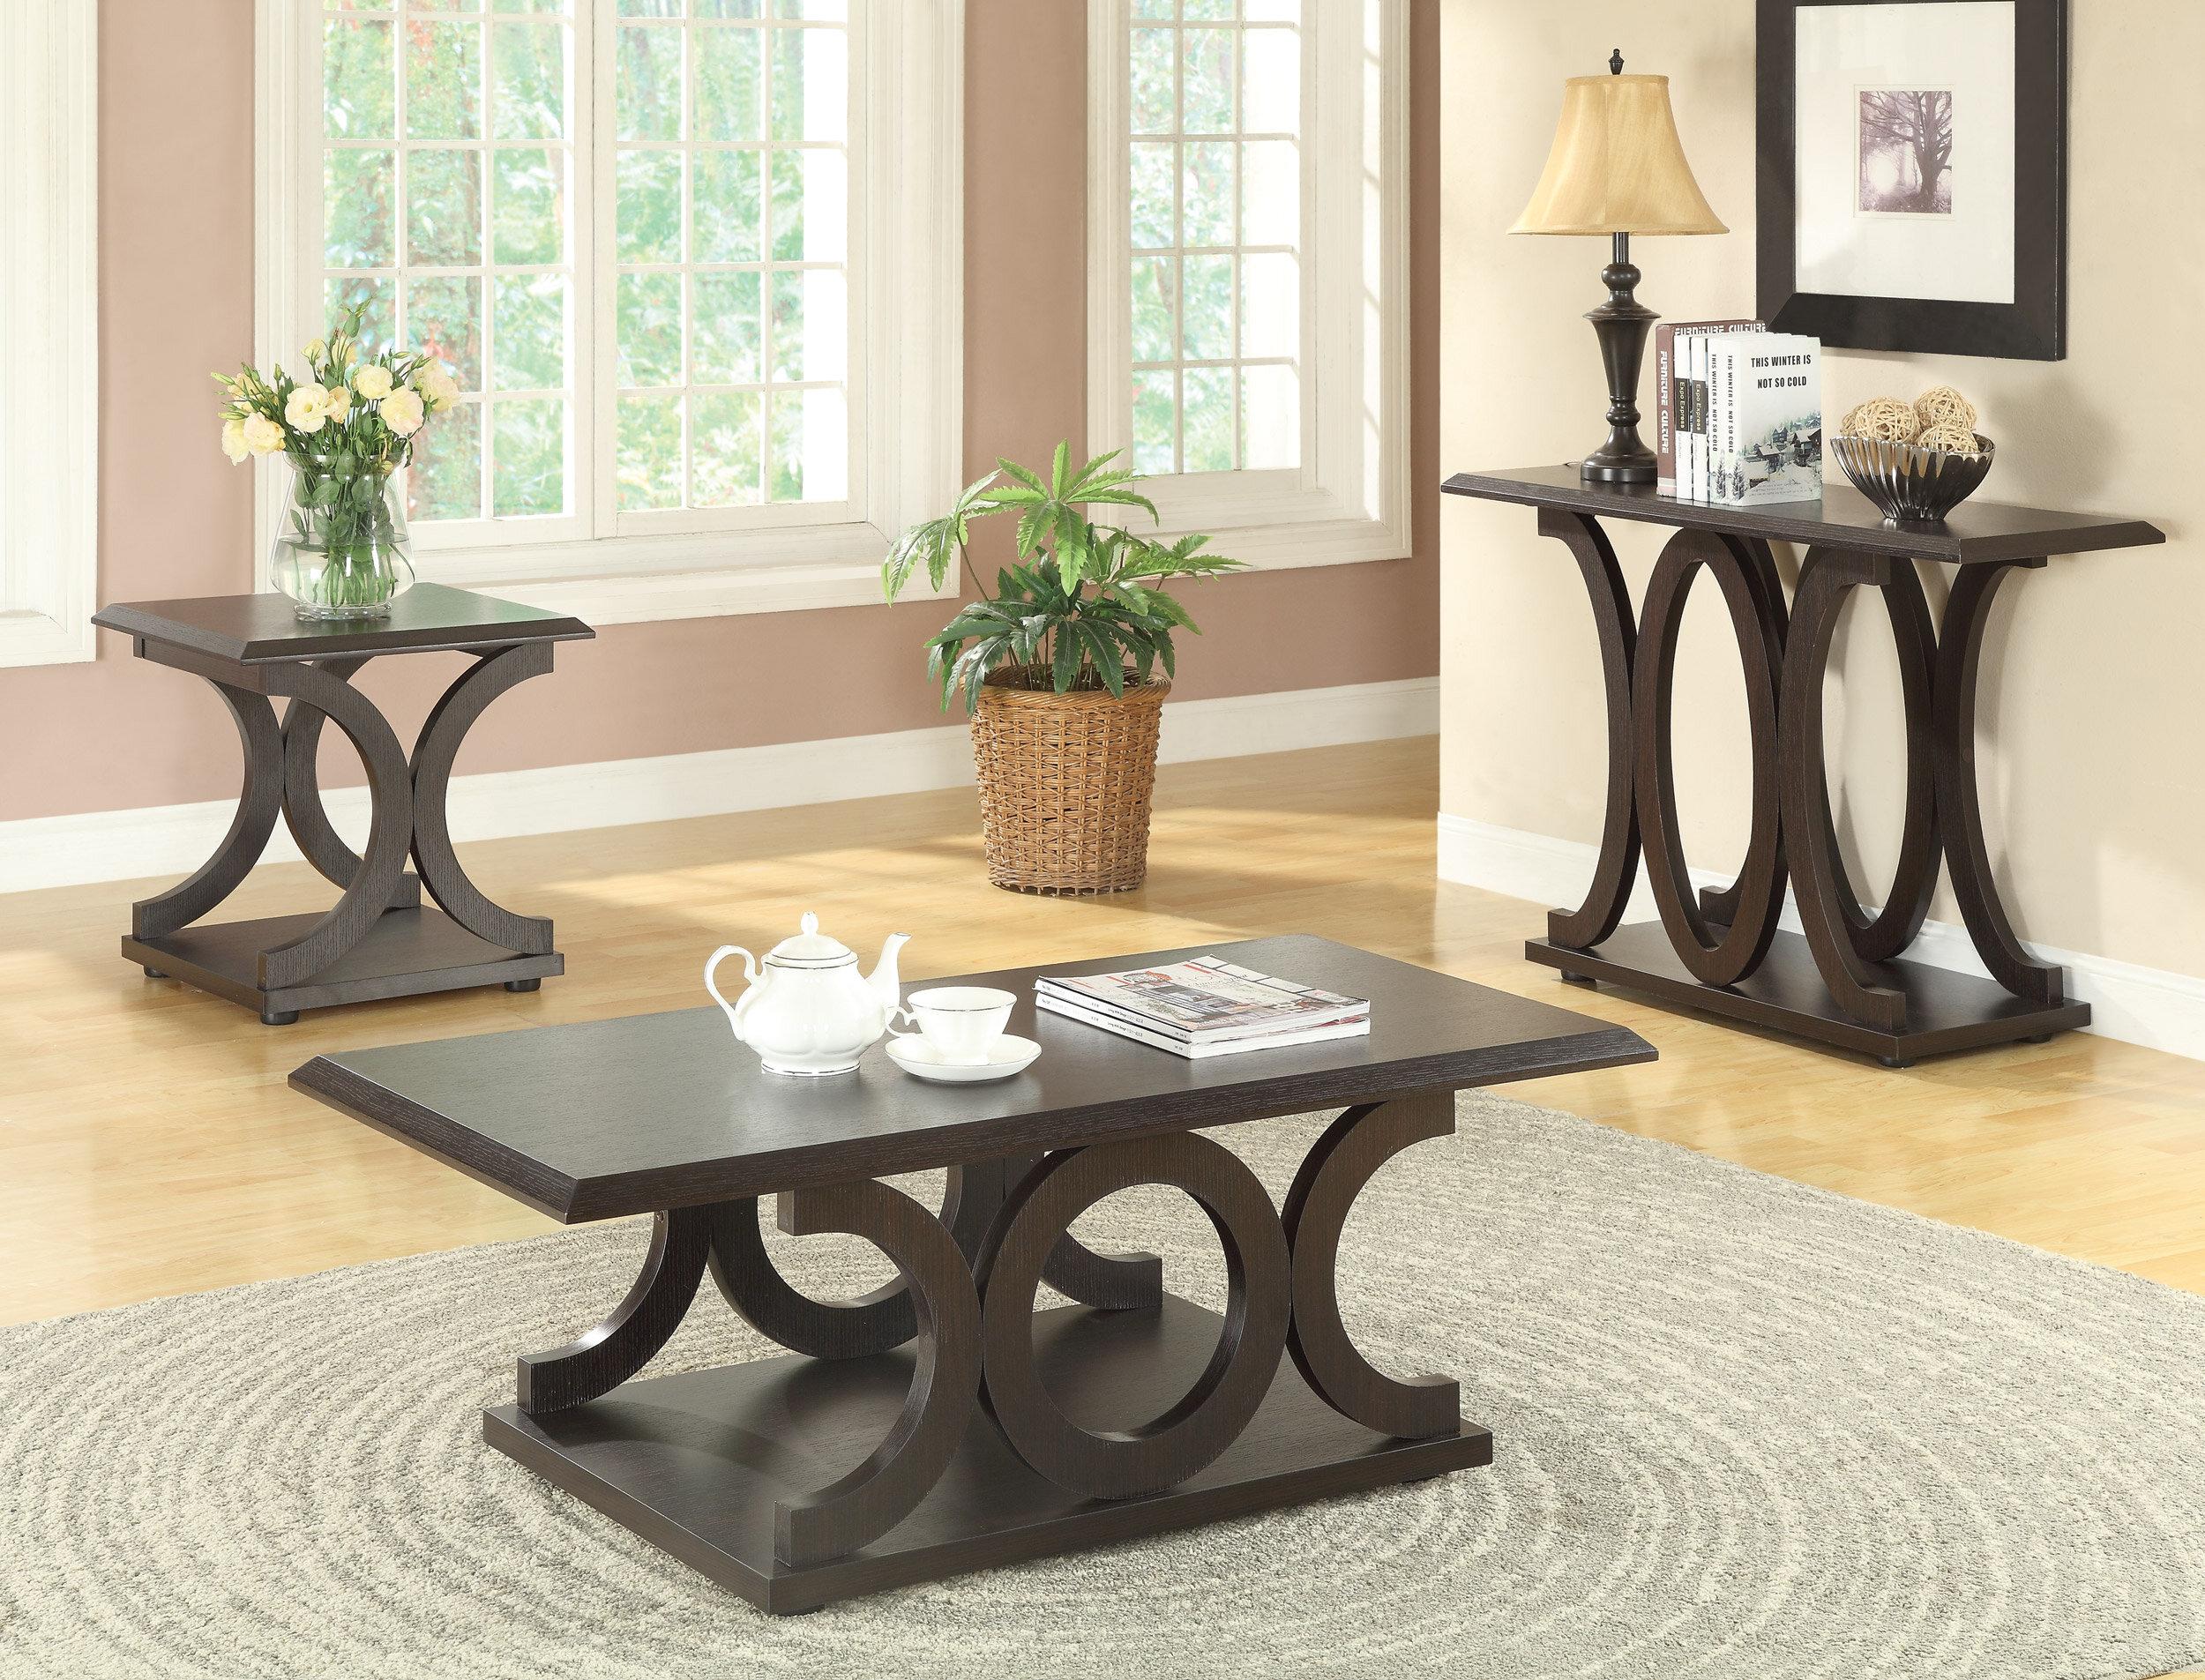 Coffee Table 3 Piece Sets.Adaline 3 Piece Coffee Table Set